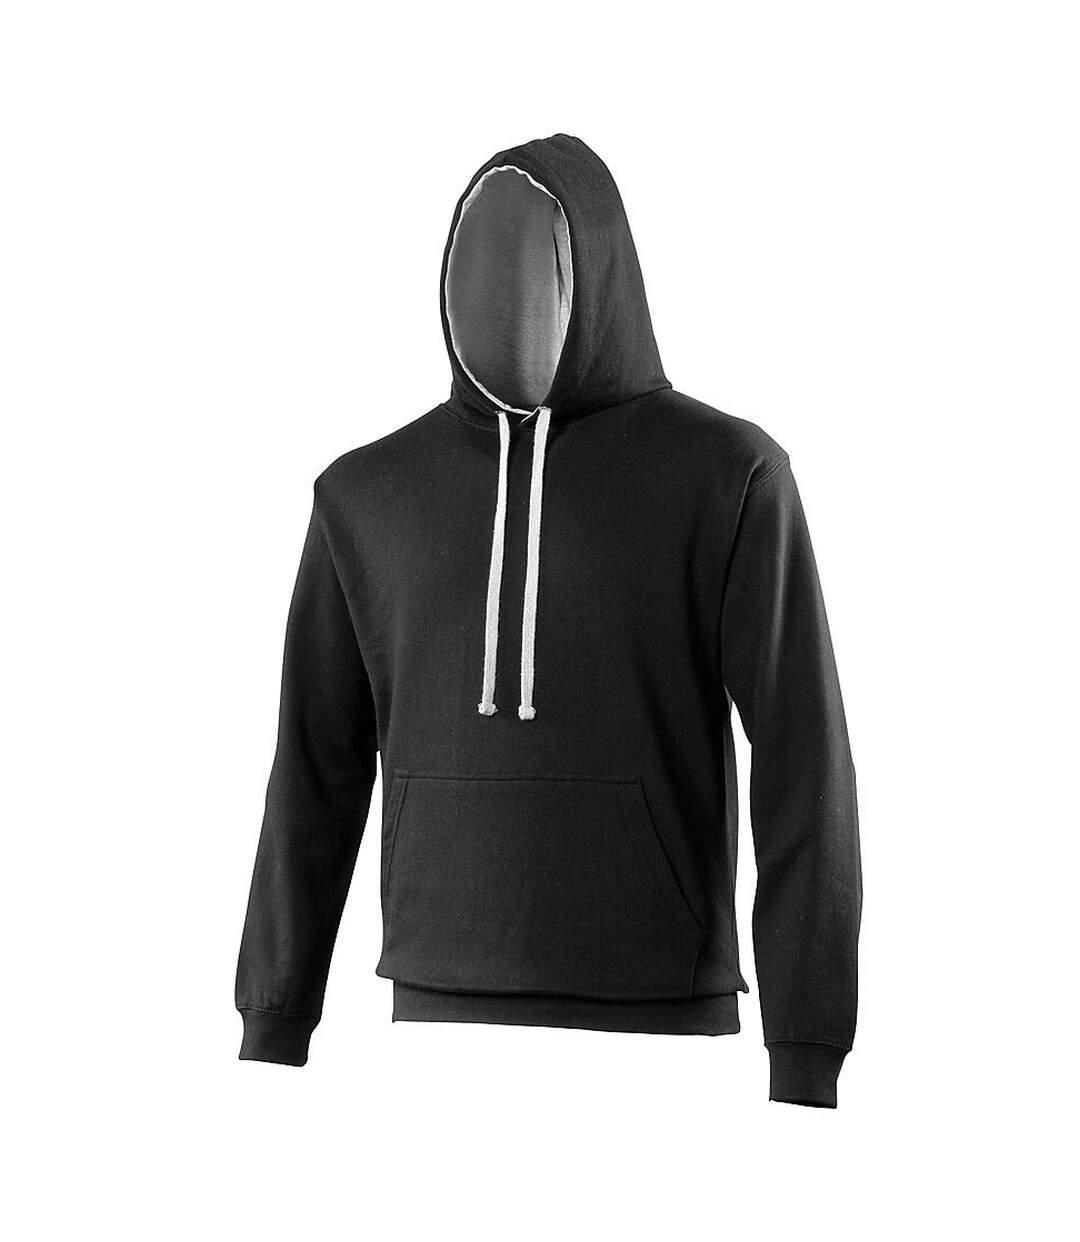 Awdis Varsity Hooded Sweatshirt / Hoodie (Burgundy/Gold) - UTRW165